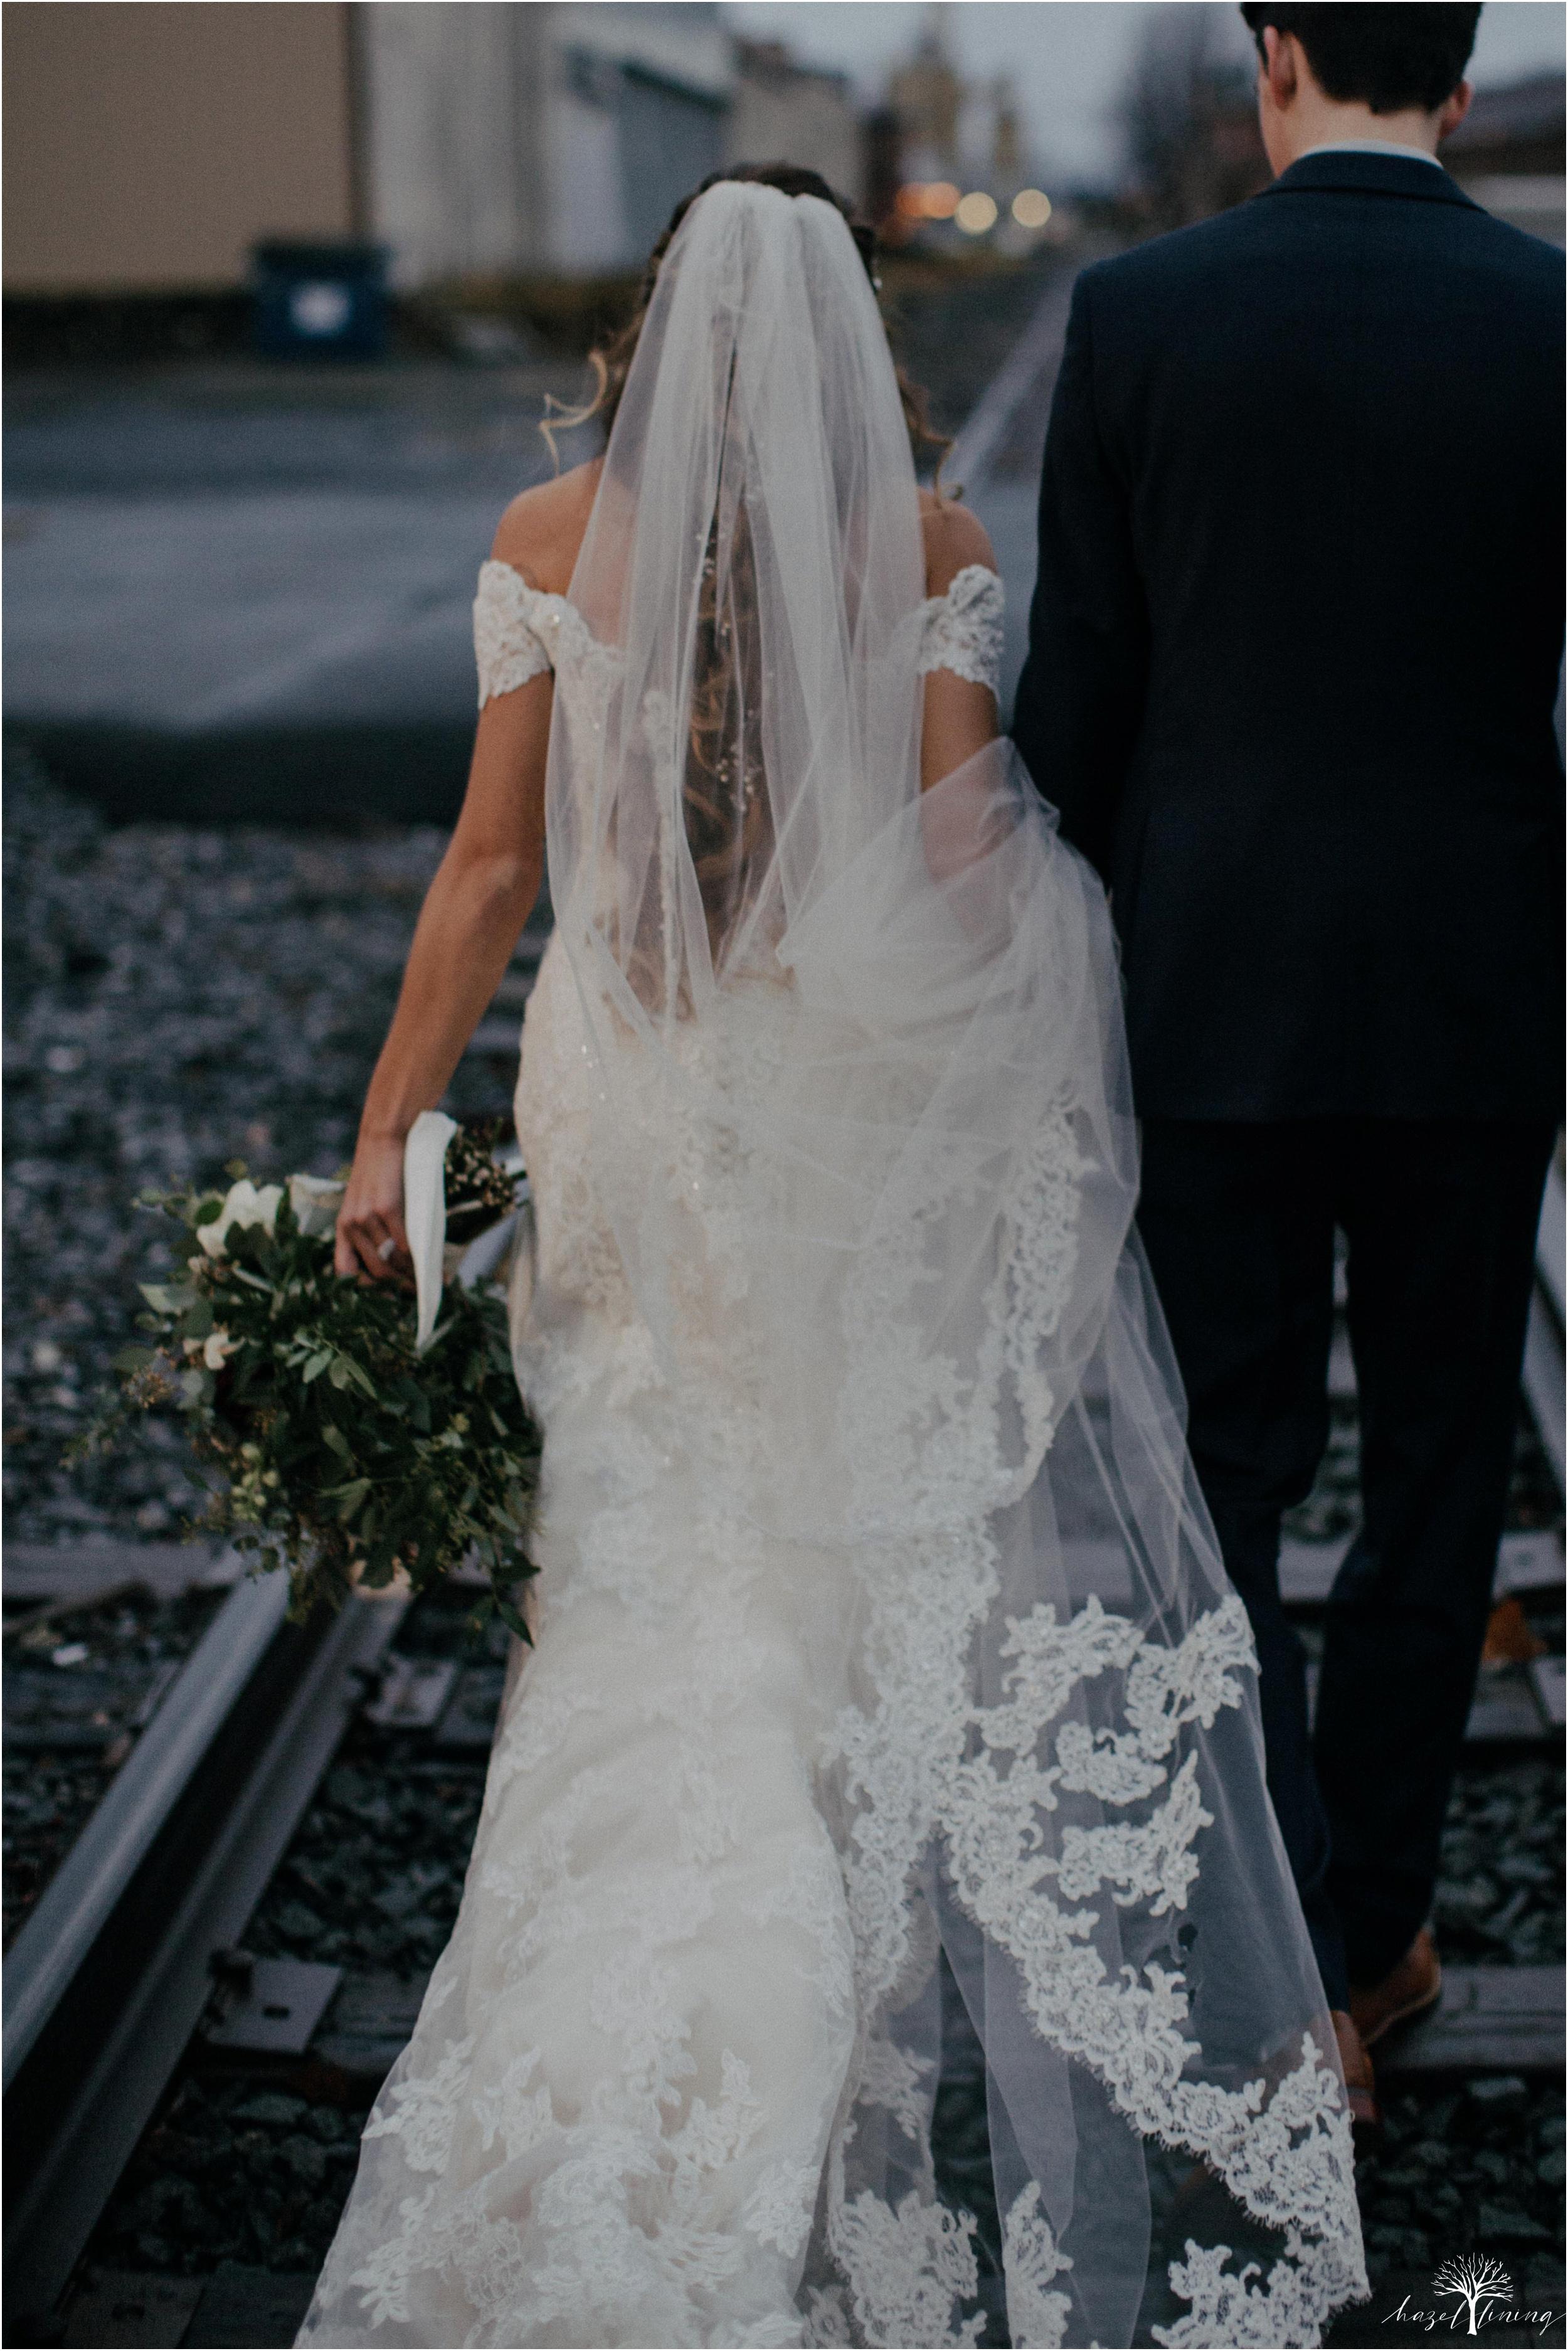 emma-matt-gehringer-the-booking-house-lancaster-manhiem-pennsylvania-winter-wedding_0107.jpg